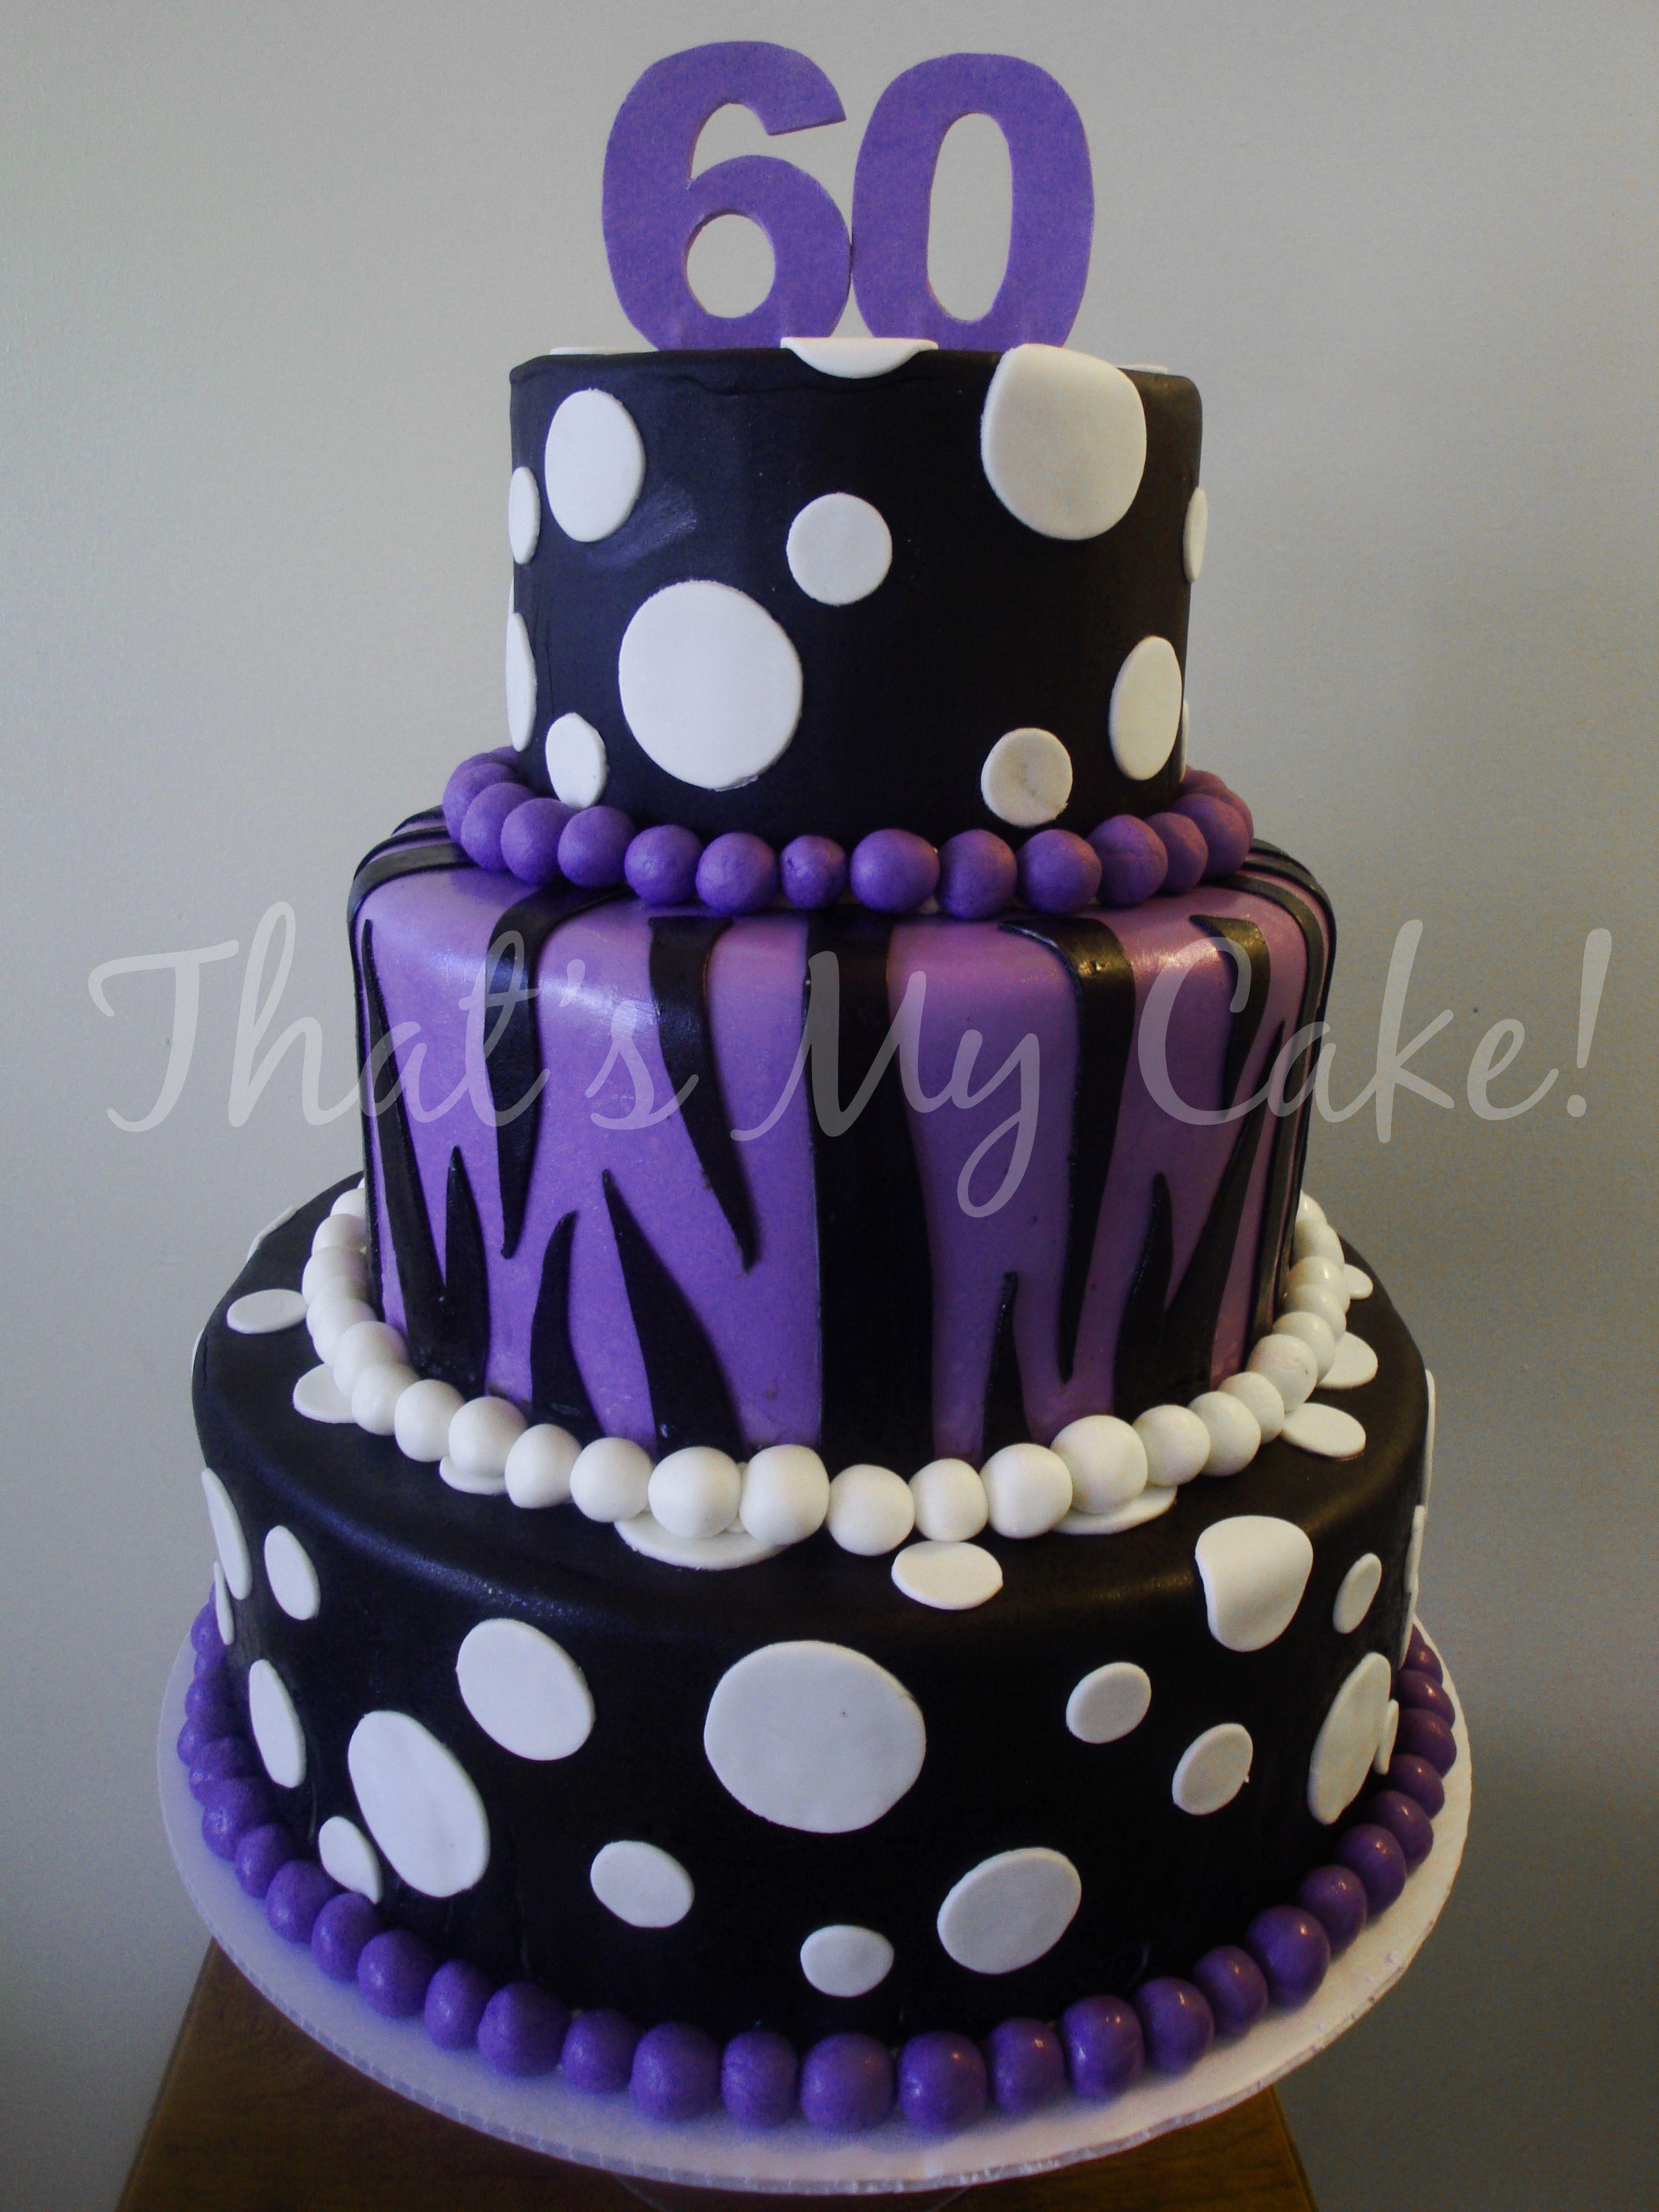 Pin By Kim Steele On Cakes Birthday Cake 60th Birthday